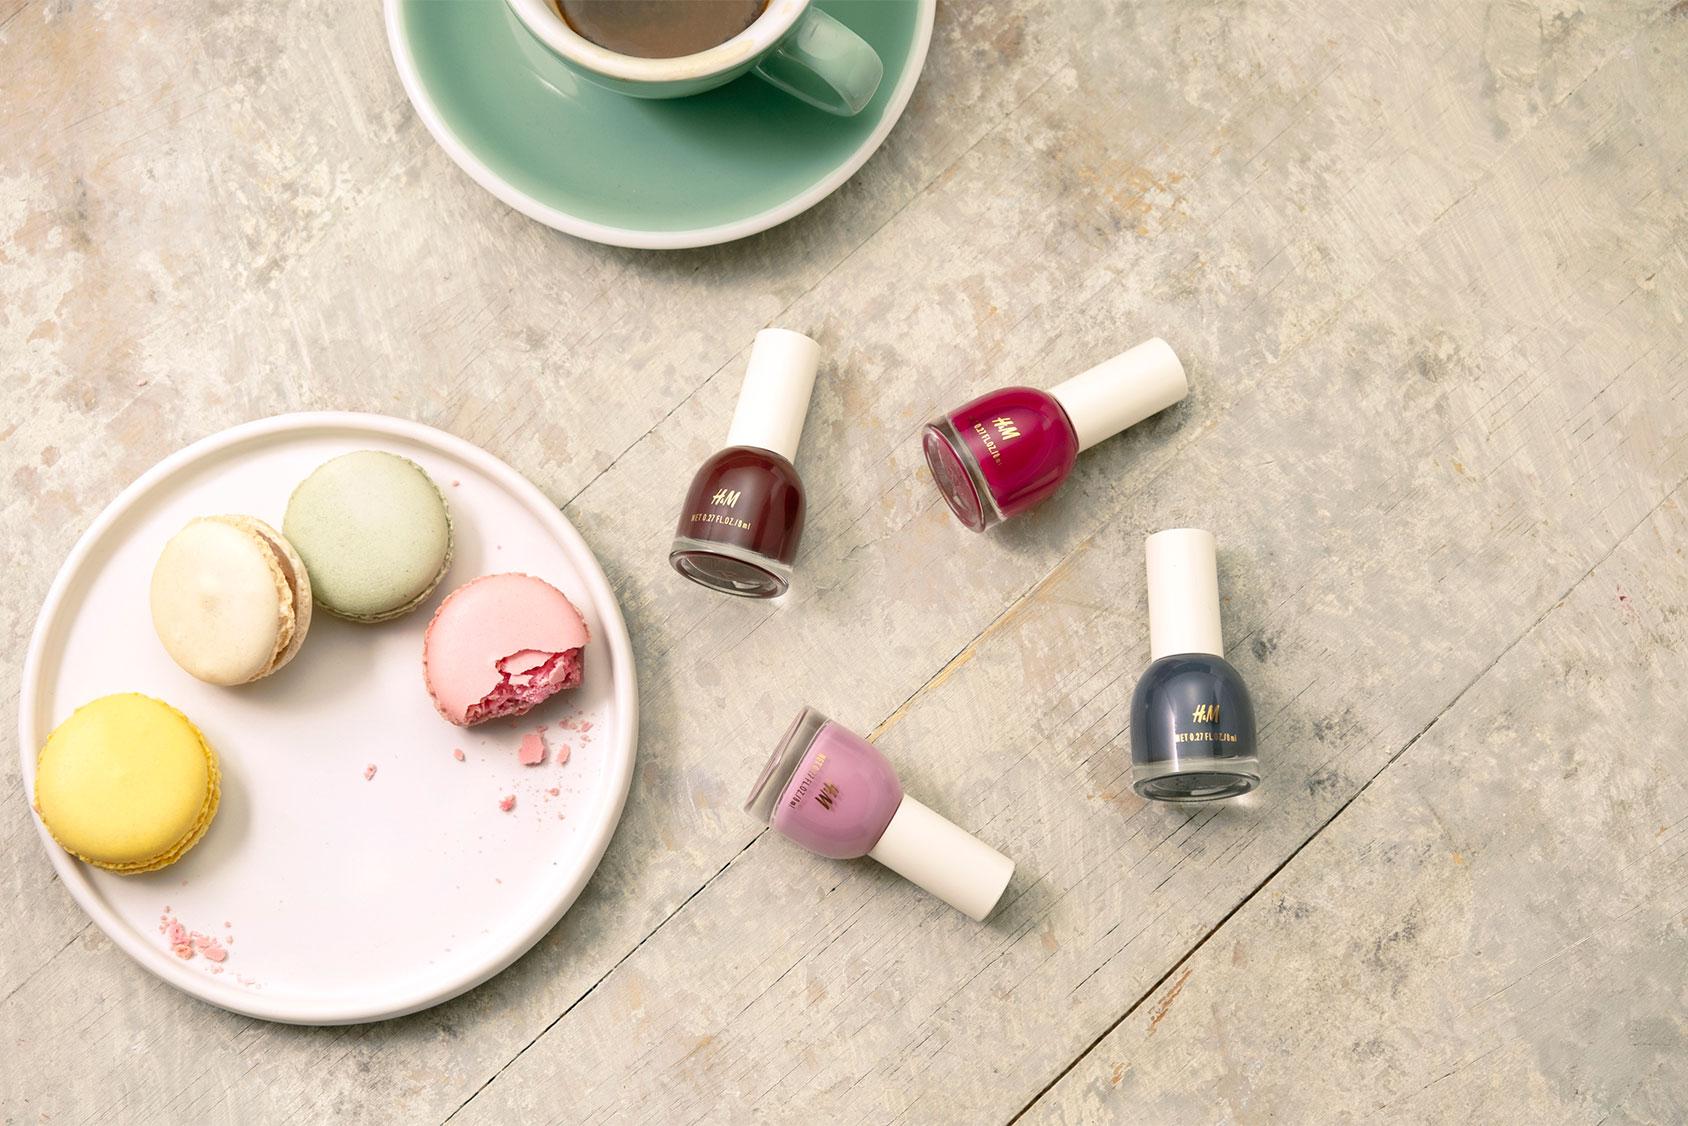 H&M Nail polish